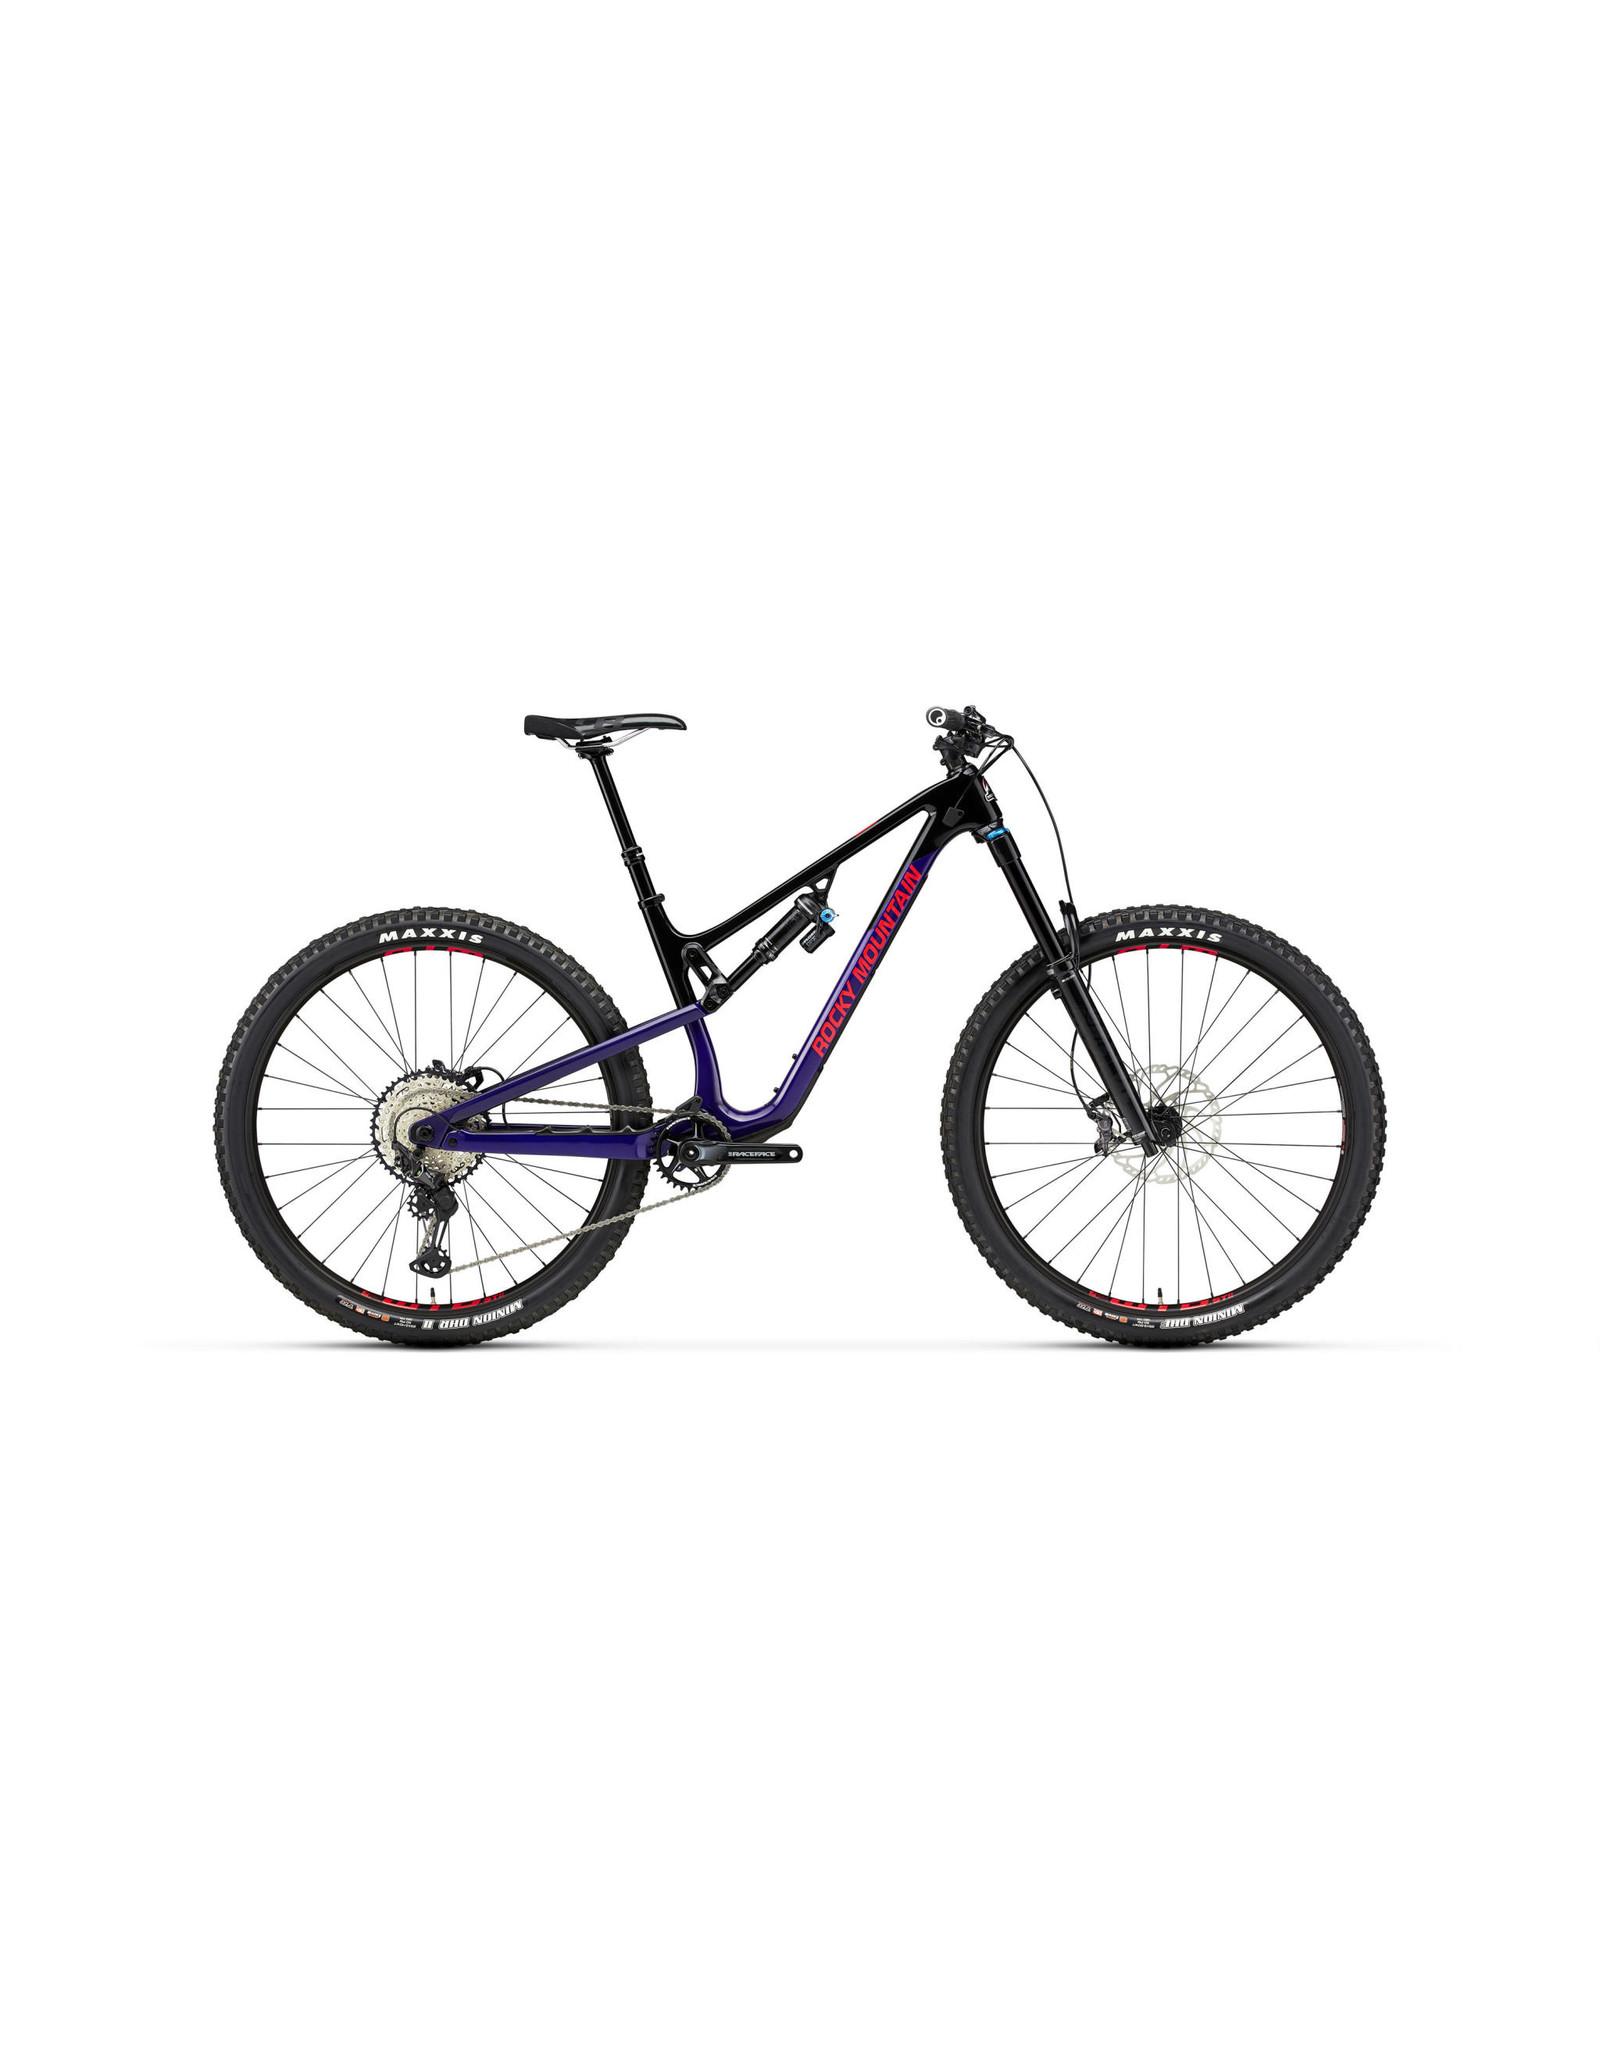 ROCKY MOUNTAIN 2021 Rocky Mountain Altitude Carbon 50 - Purple/Black - Large